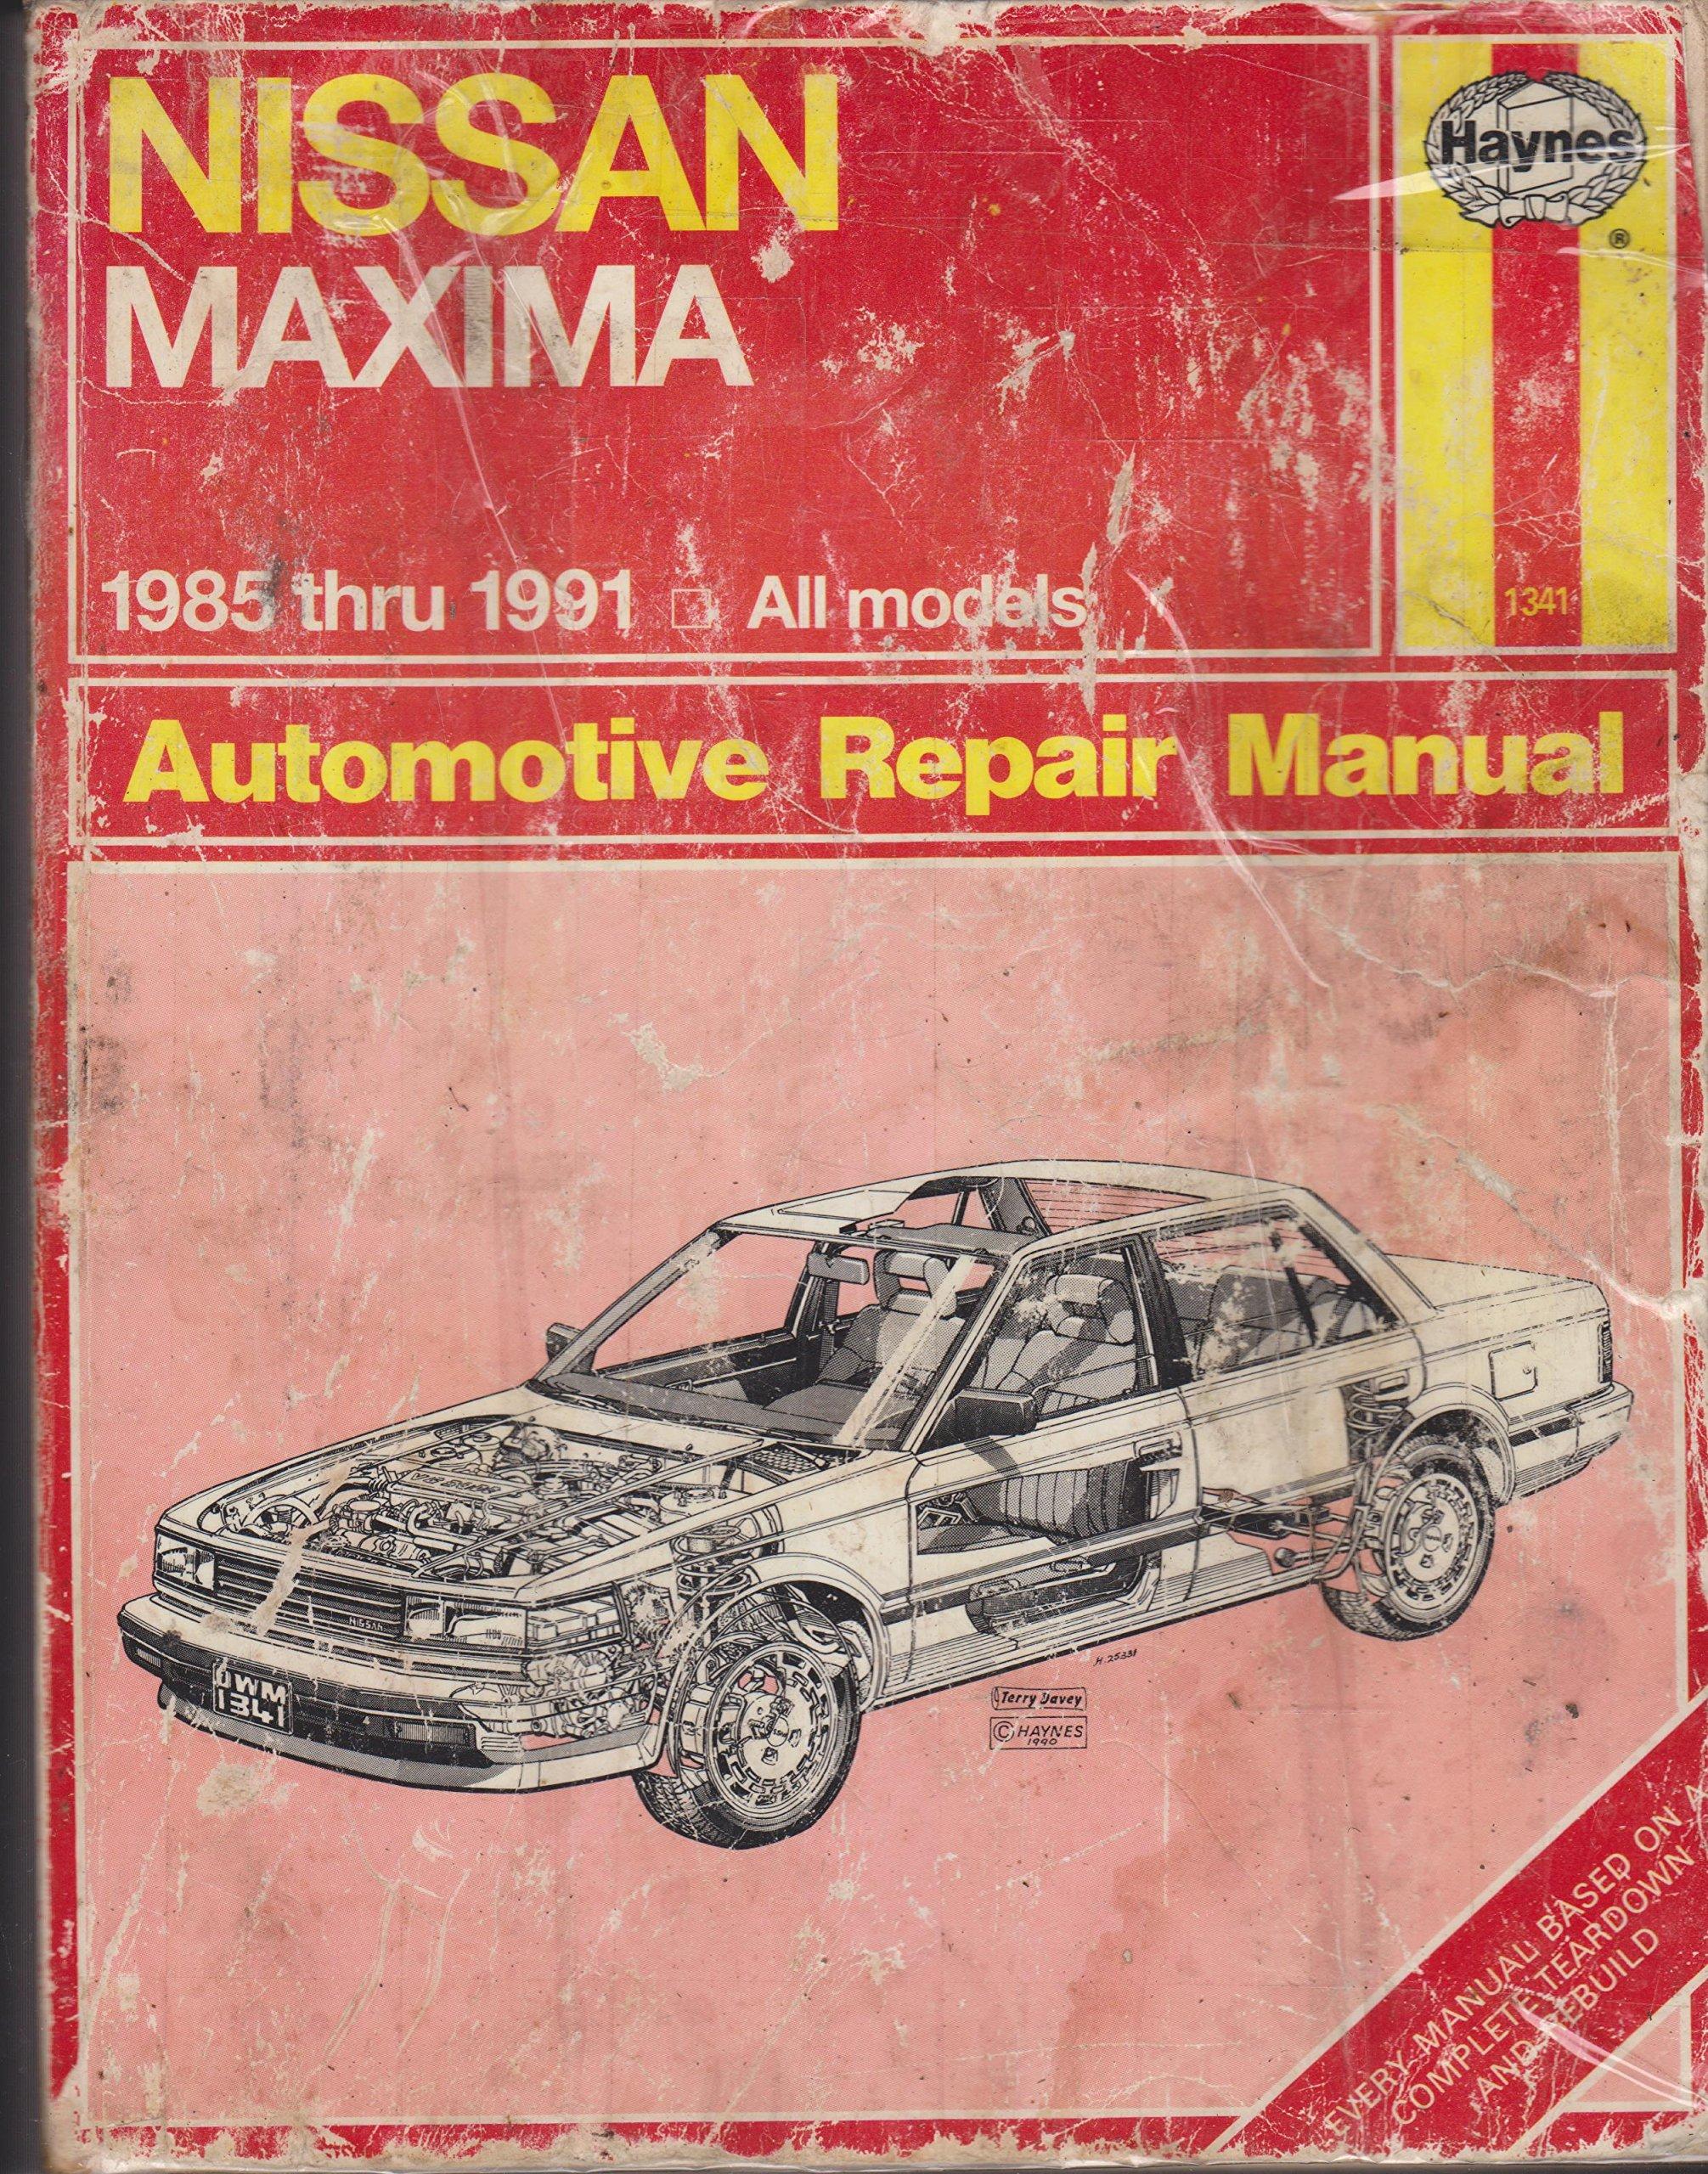 nissan maxima automotive repair manual haynes automotive repair rh amazon com 1992 nissan maxima owner's manual 1991 Nissan Maxima